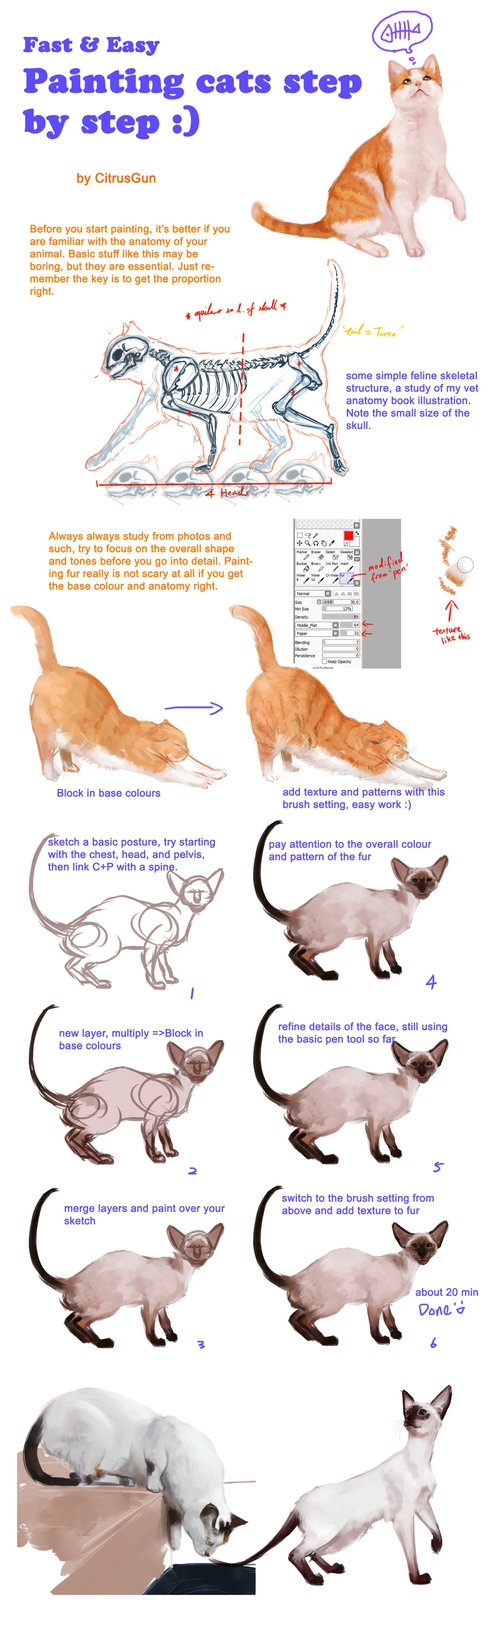 Painting cats tutorial by *CitrusGun on deviantART